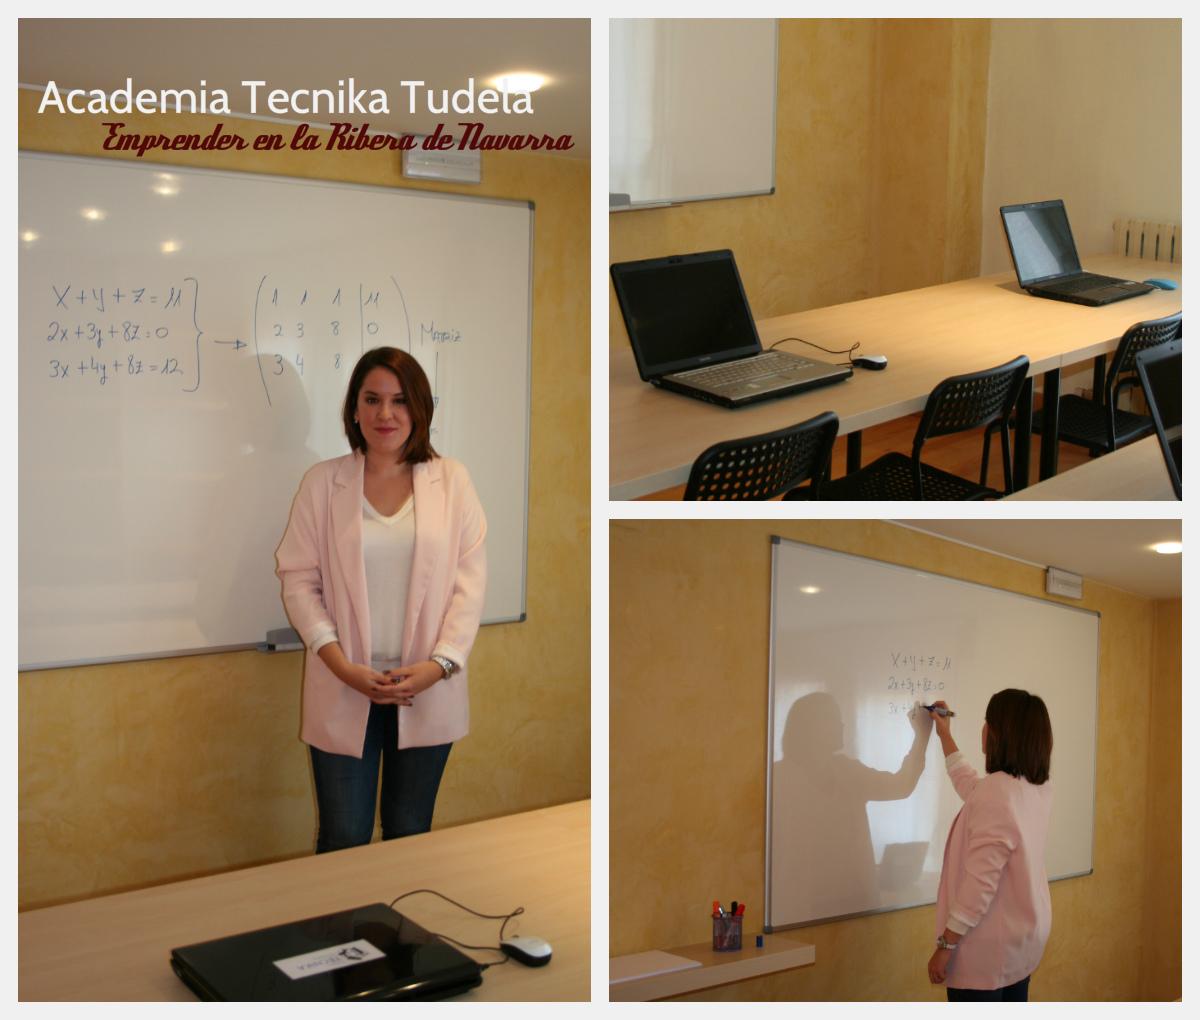 Academia Técnika Tudela; Emprender en la Ribera de Navarra